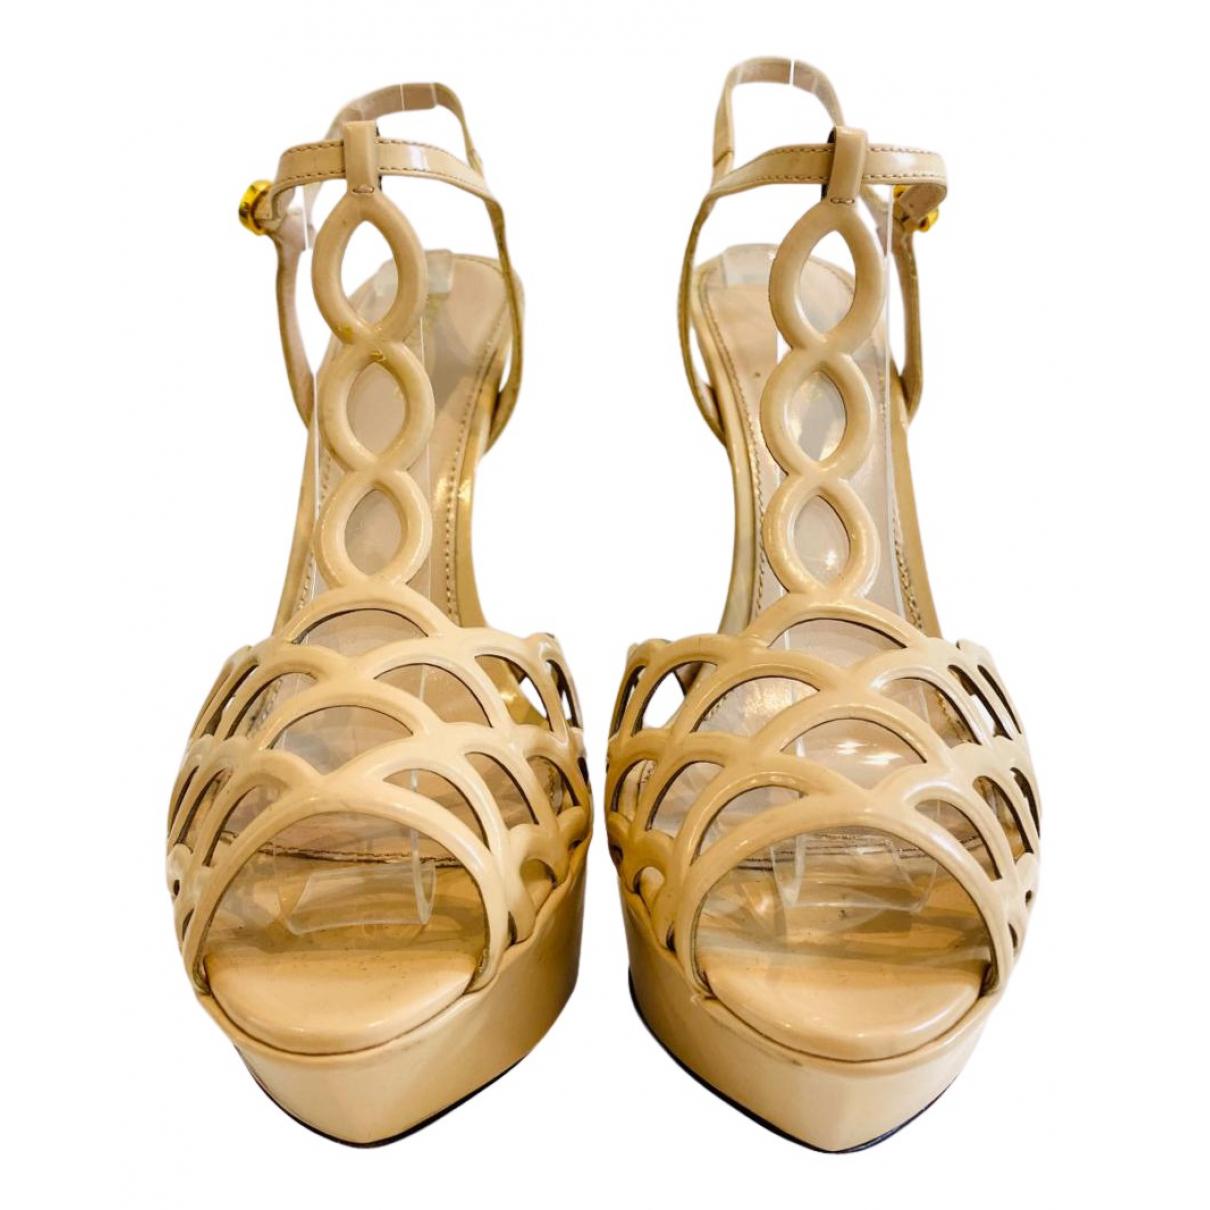 Sergio Rossi N Beige Patent leather Heels for Women 37.5 EU